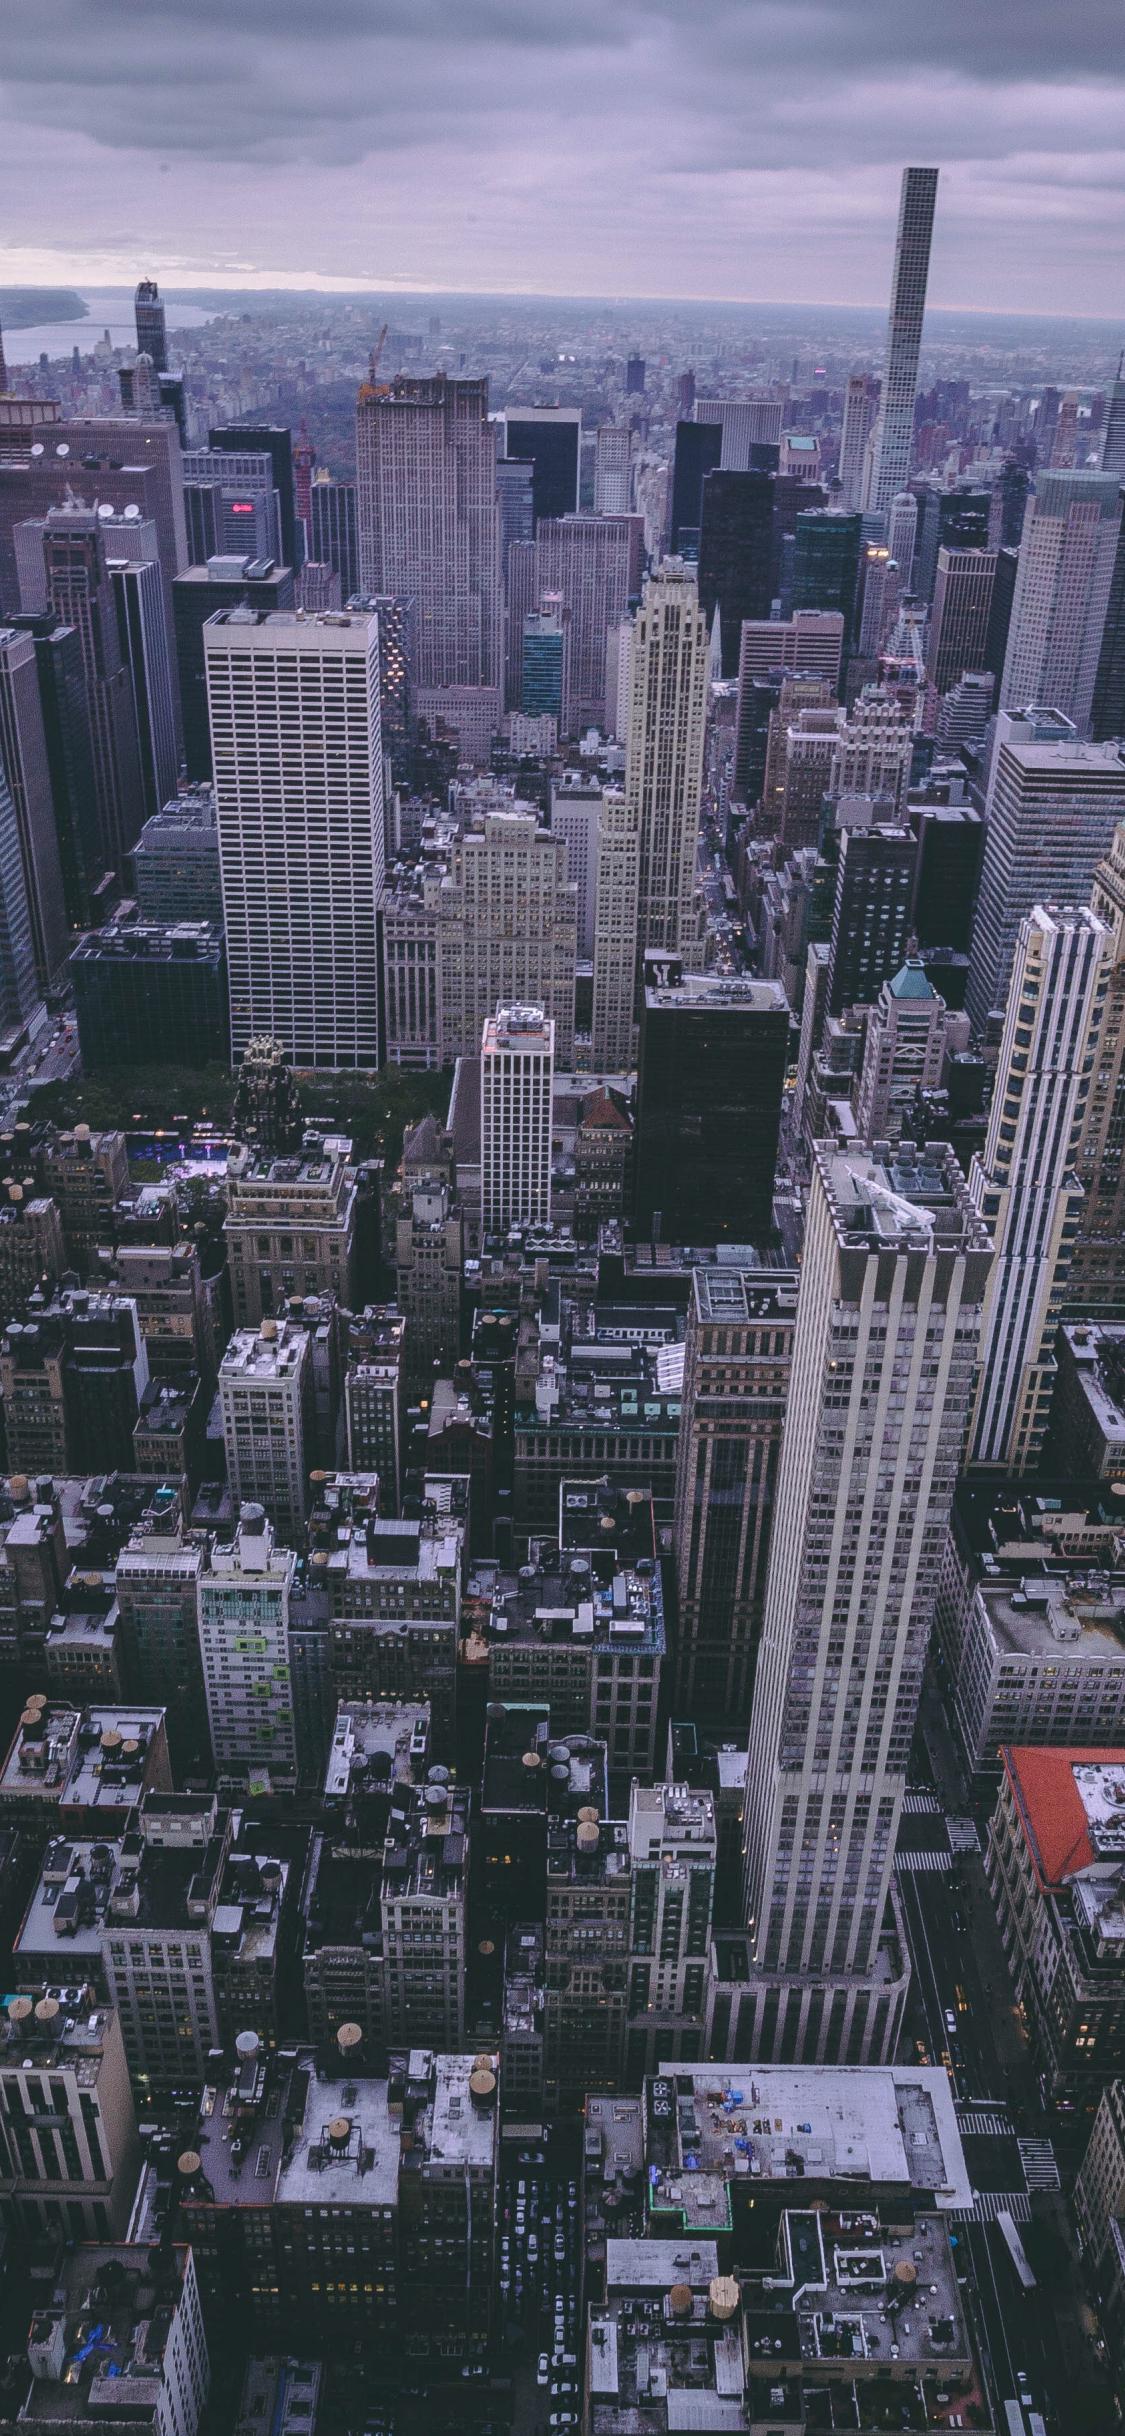 New york, city, buildings, aerial view, 1125x2436 wallpaper